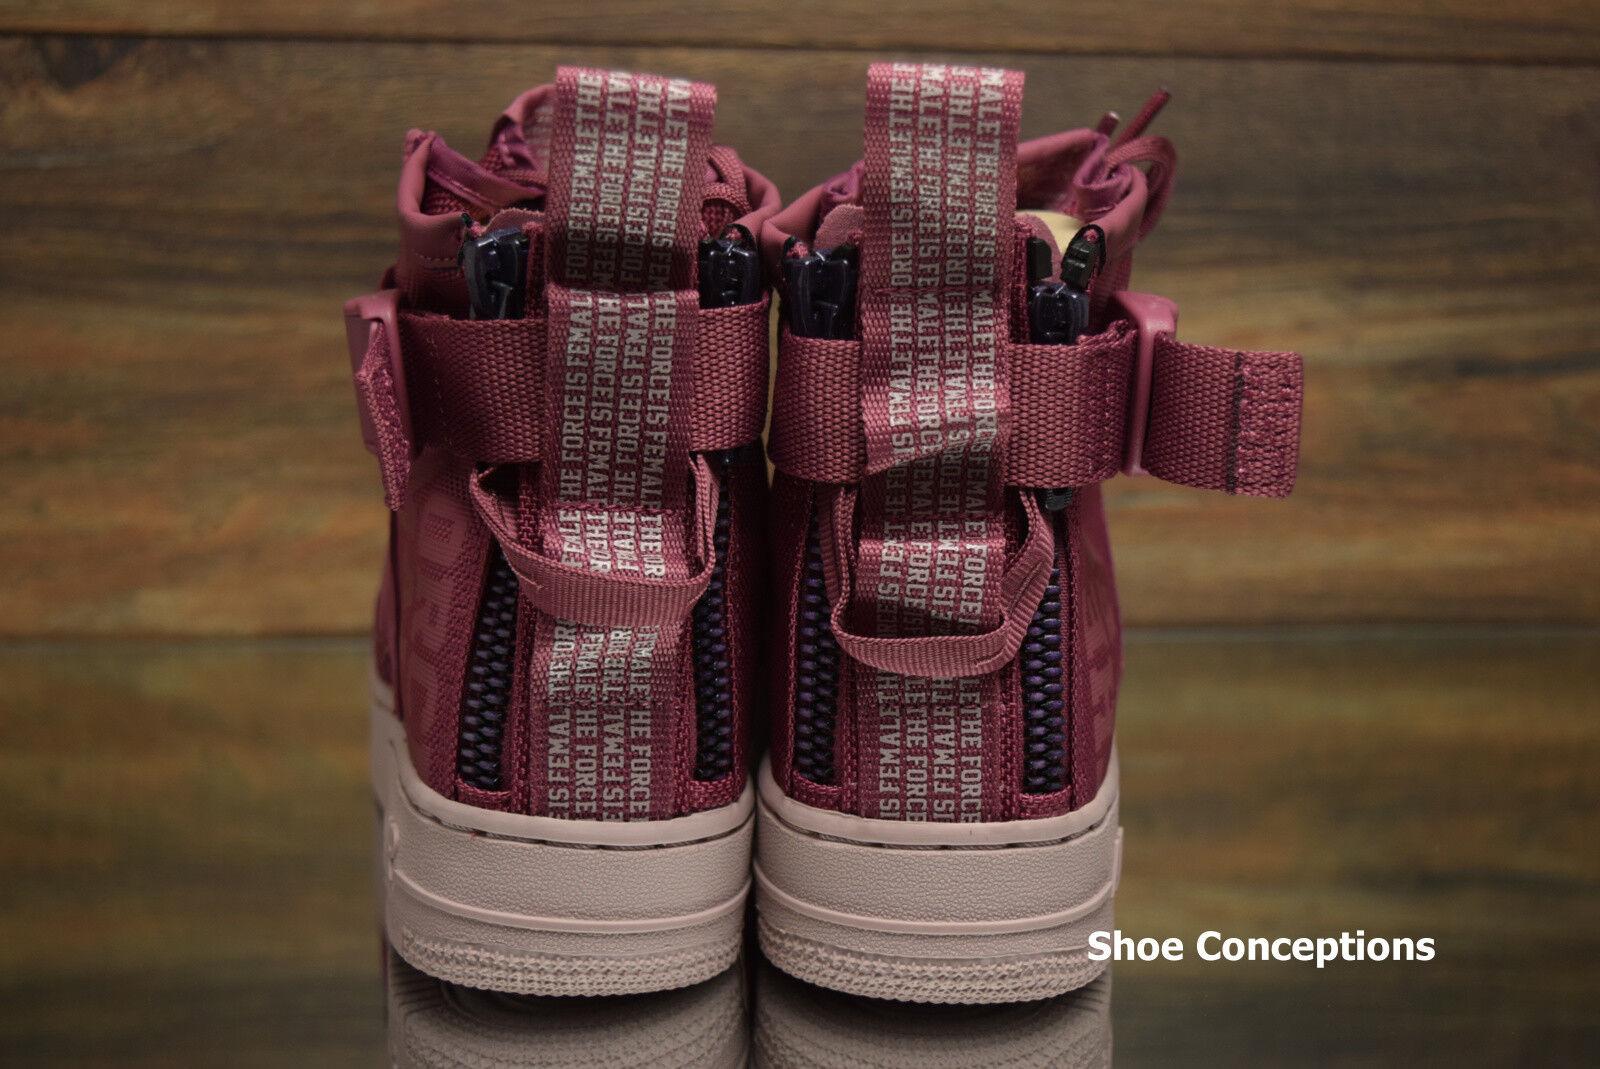 Nike SF Air Force 1 MID FIF Vintage Wine Wine Wine AJ1698-600 Women's shoes Multi Size 1f561d